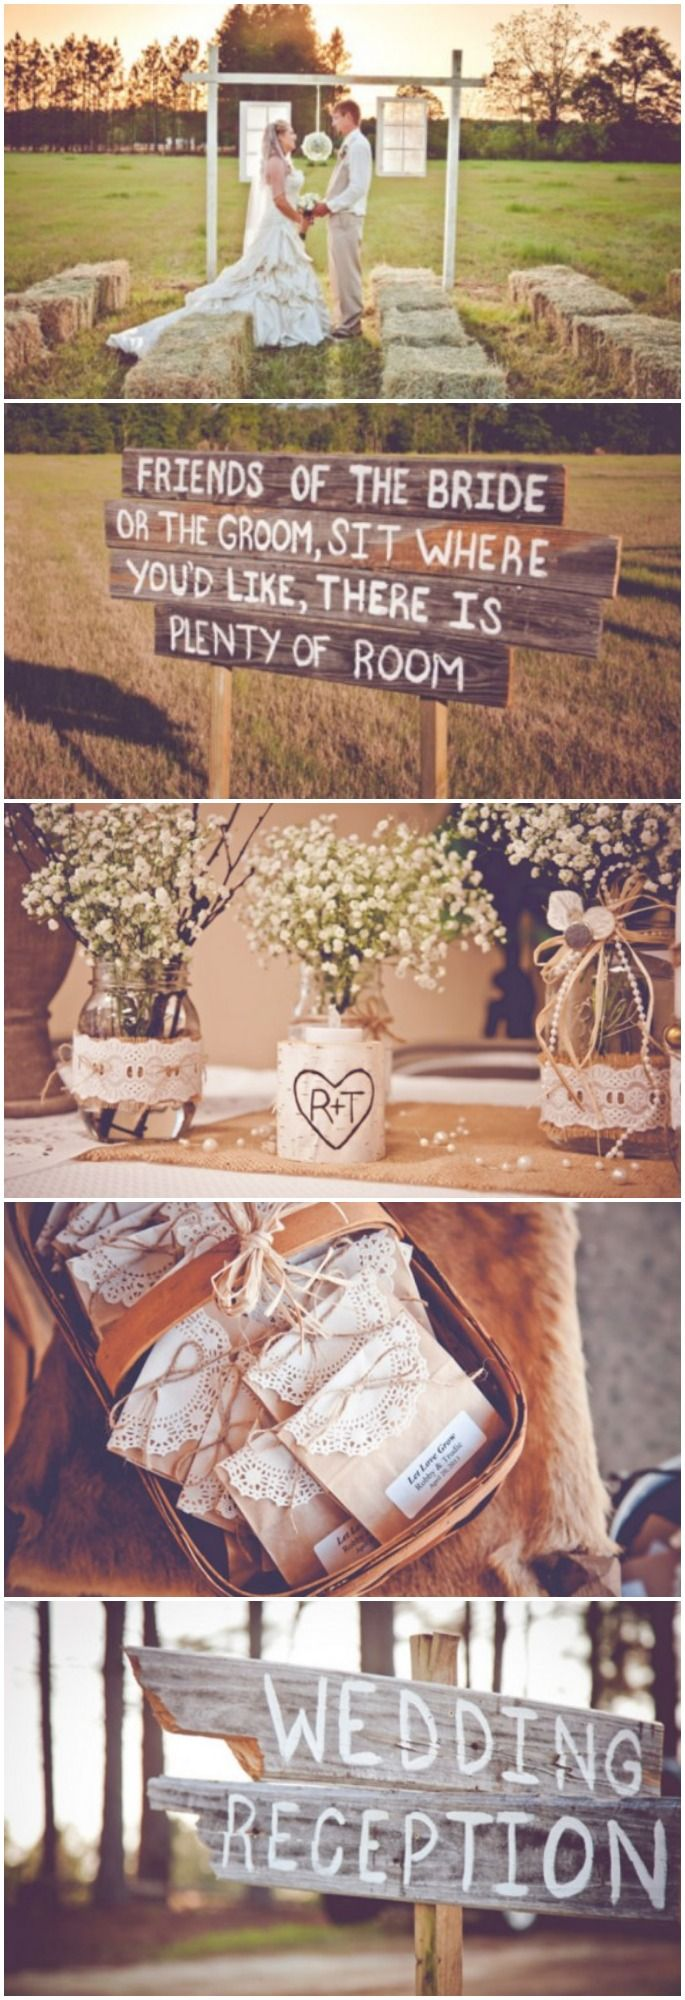 Matrimonio vintage y romántico 9